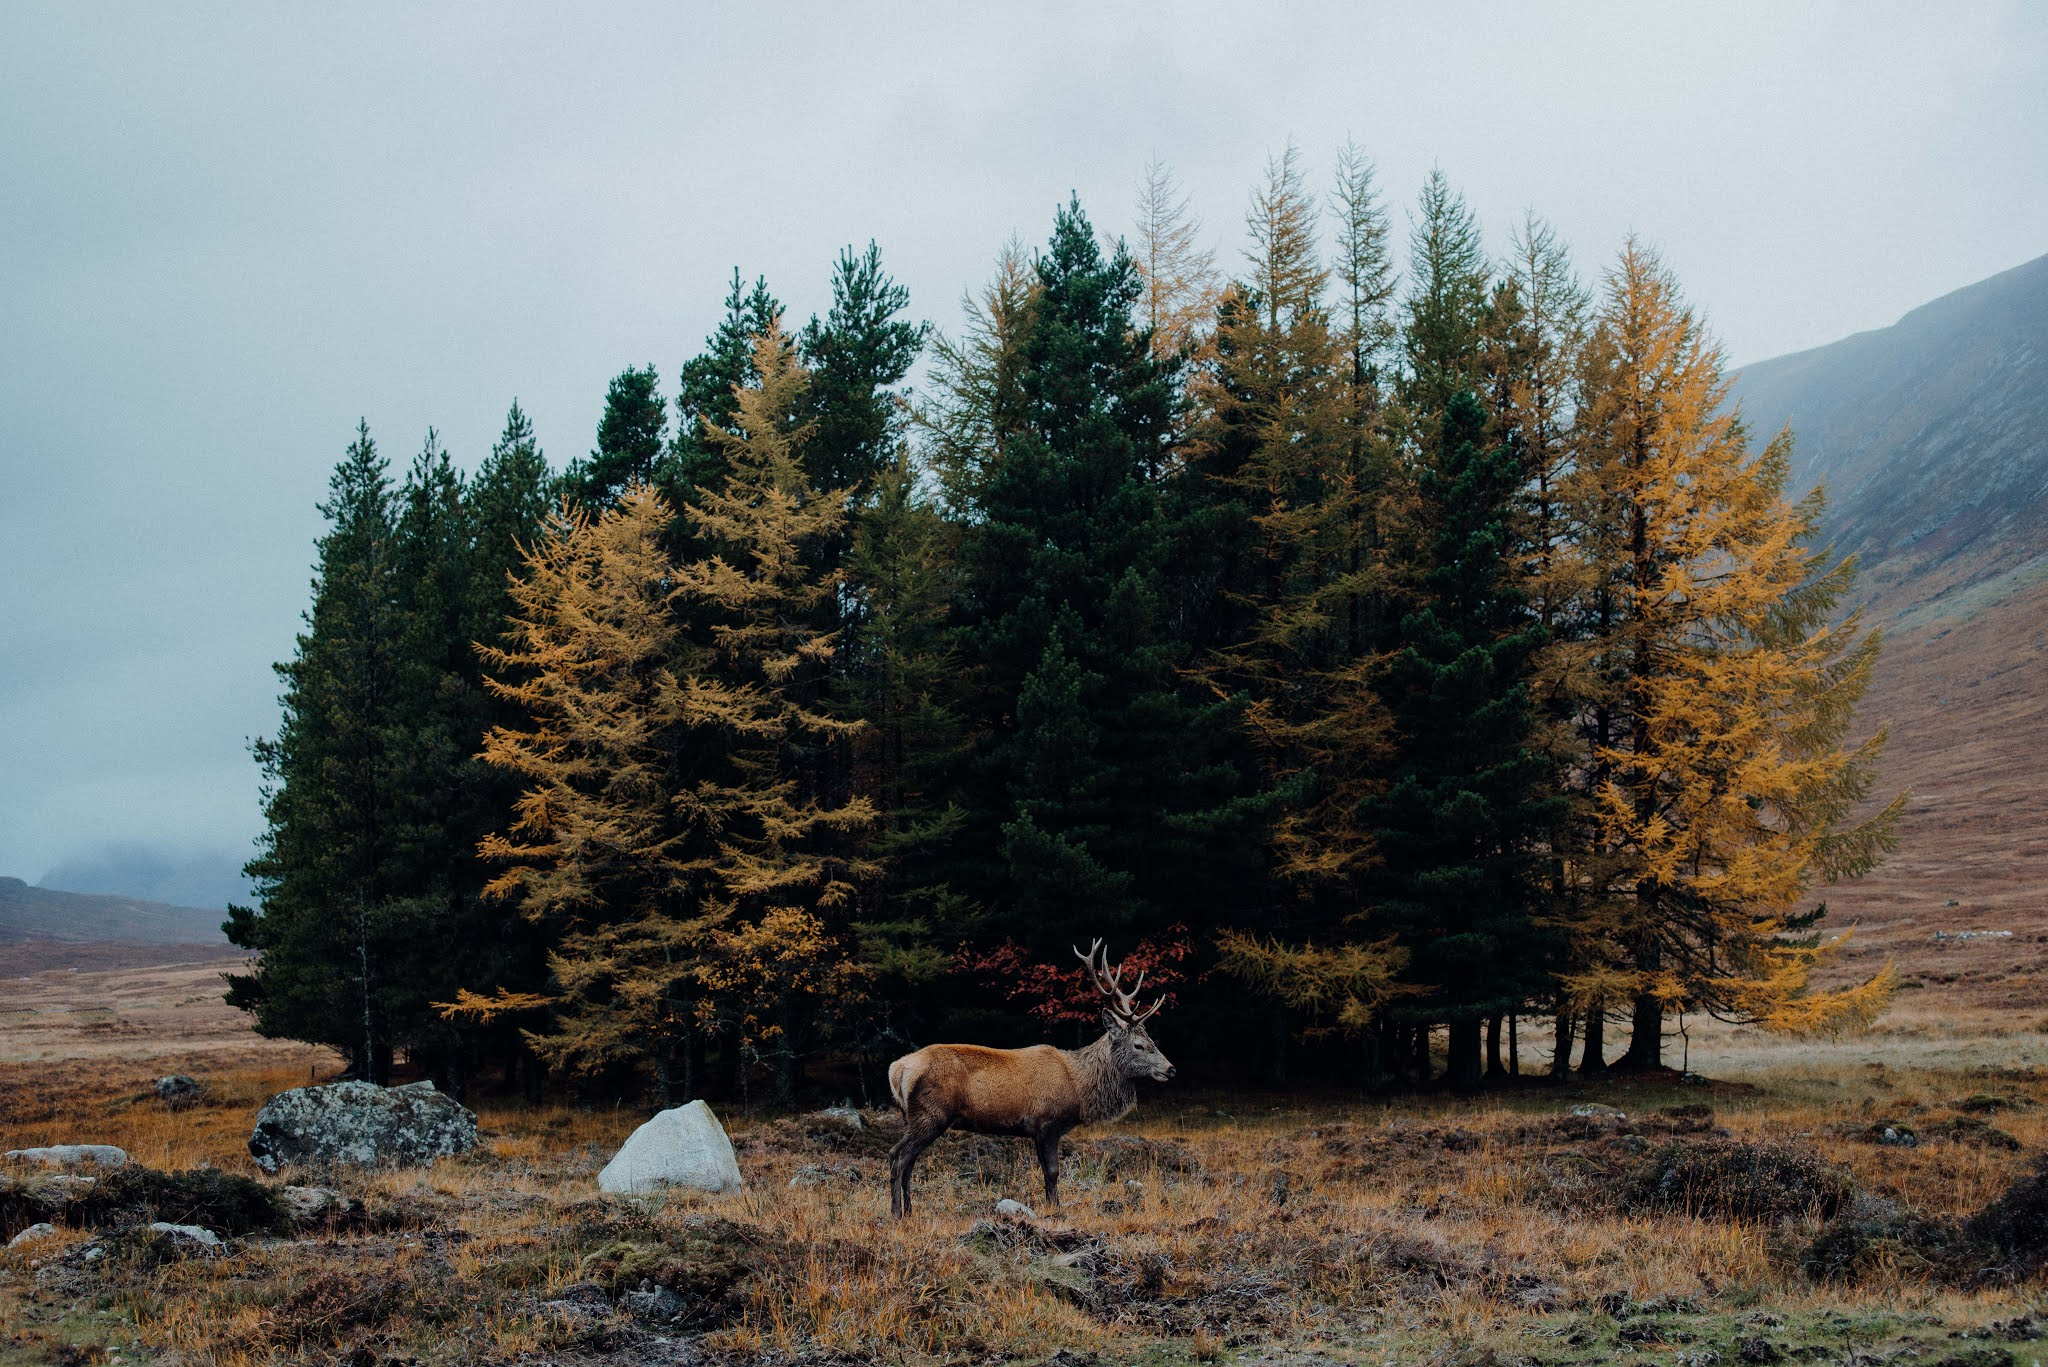 deer stag spotting glencoe liquid grain scotland